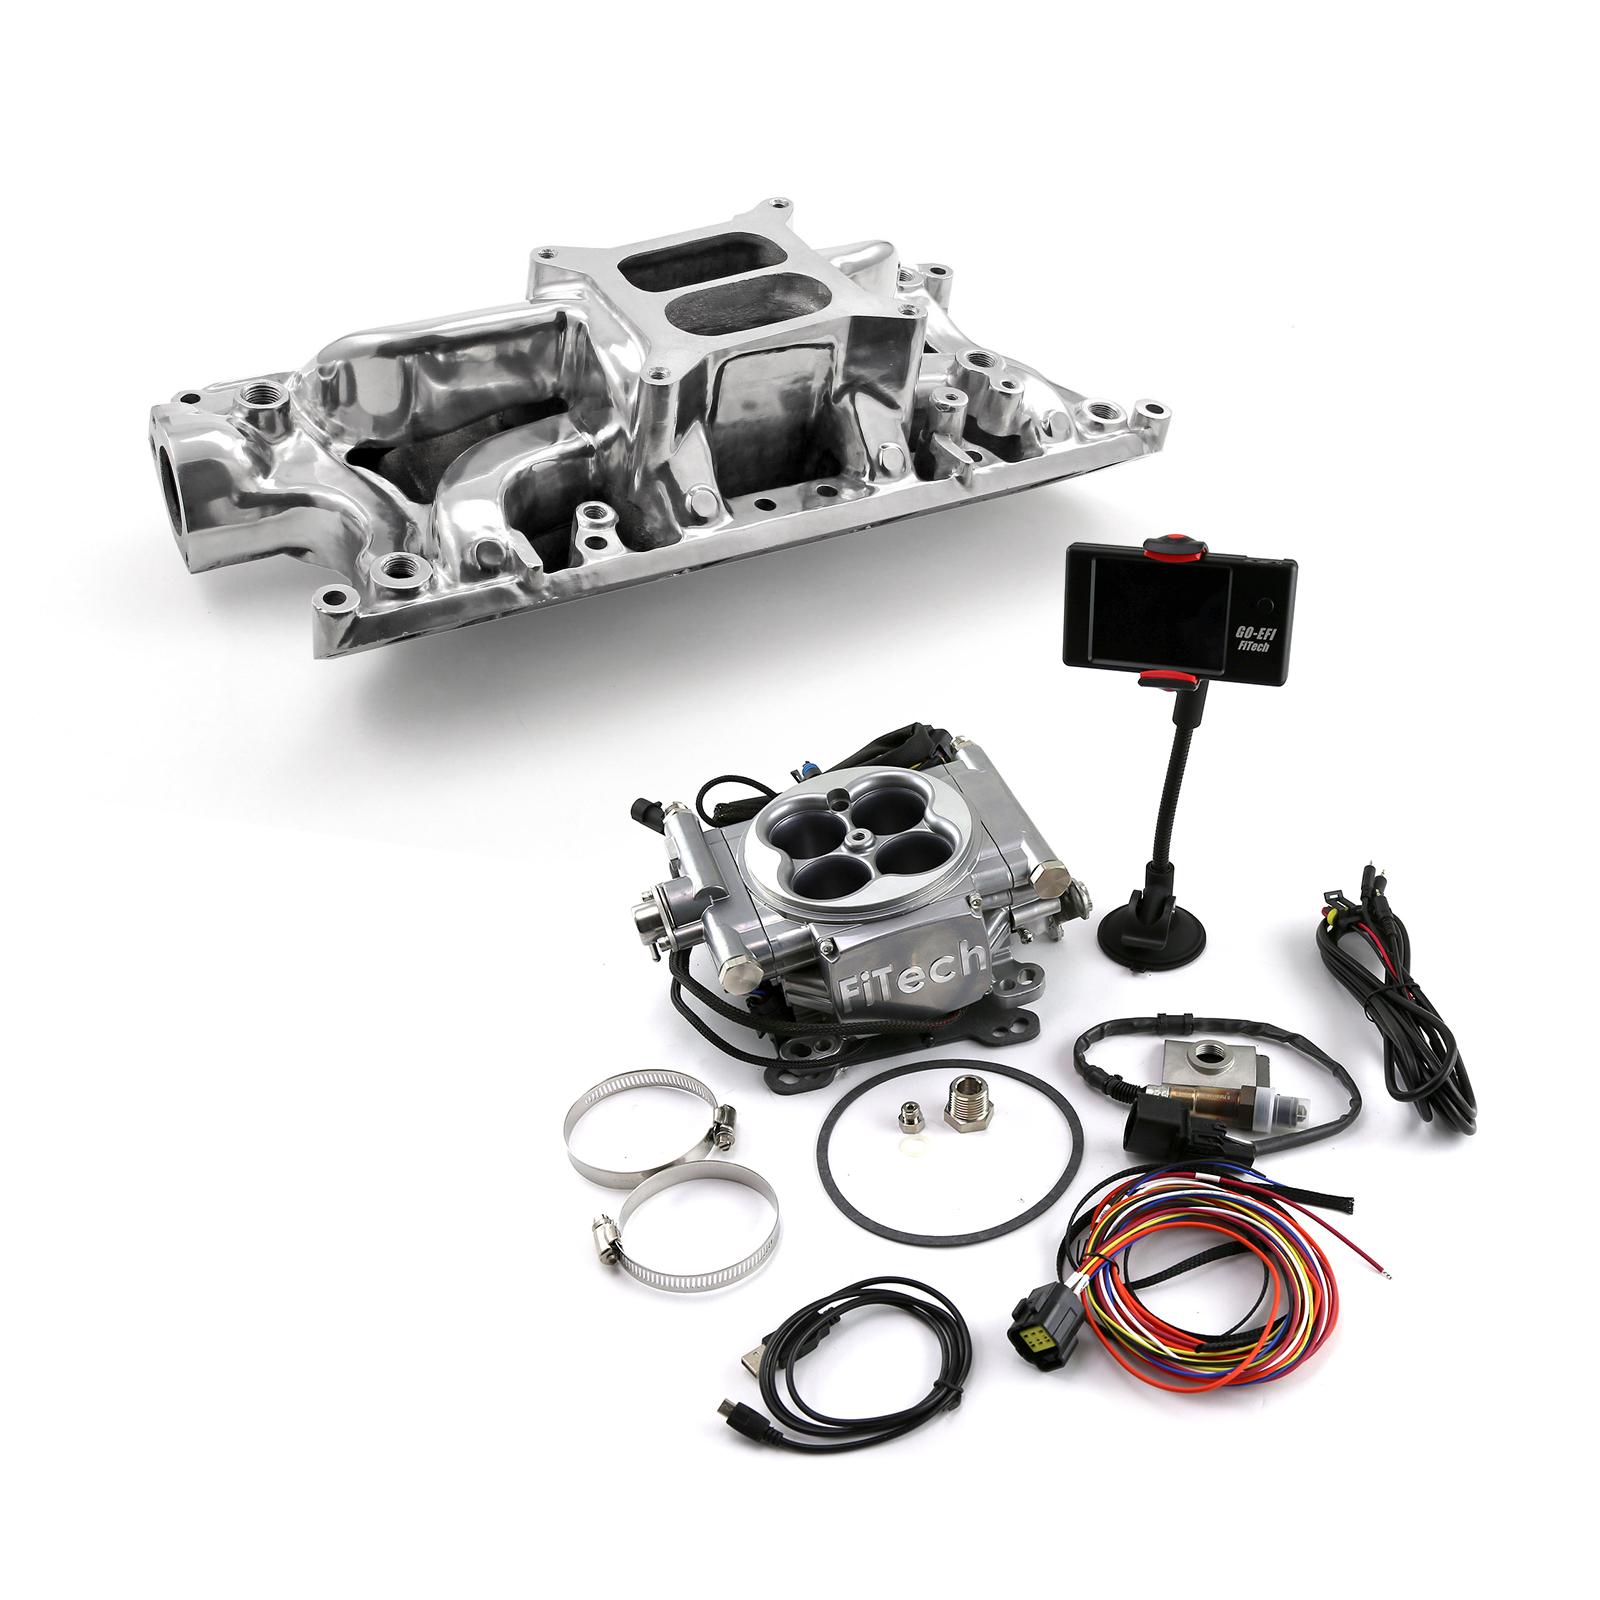 Ford SB 289 302W Eliminator Manifold & FiTech Go EFI 30001 Fuel Injection